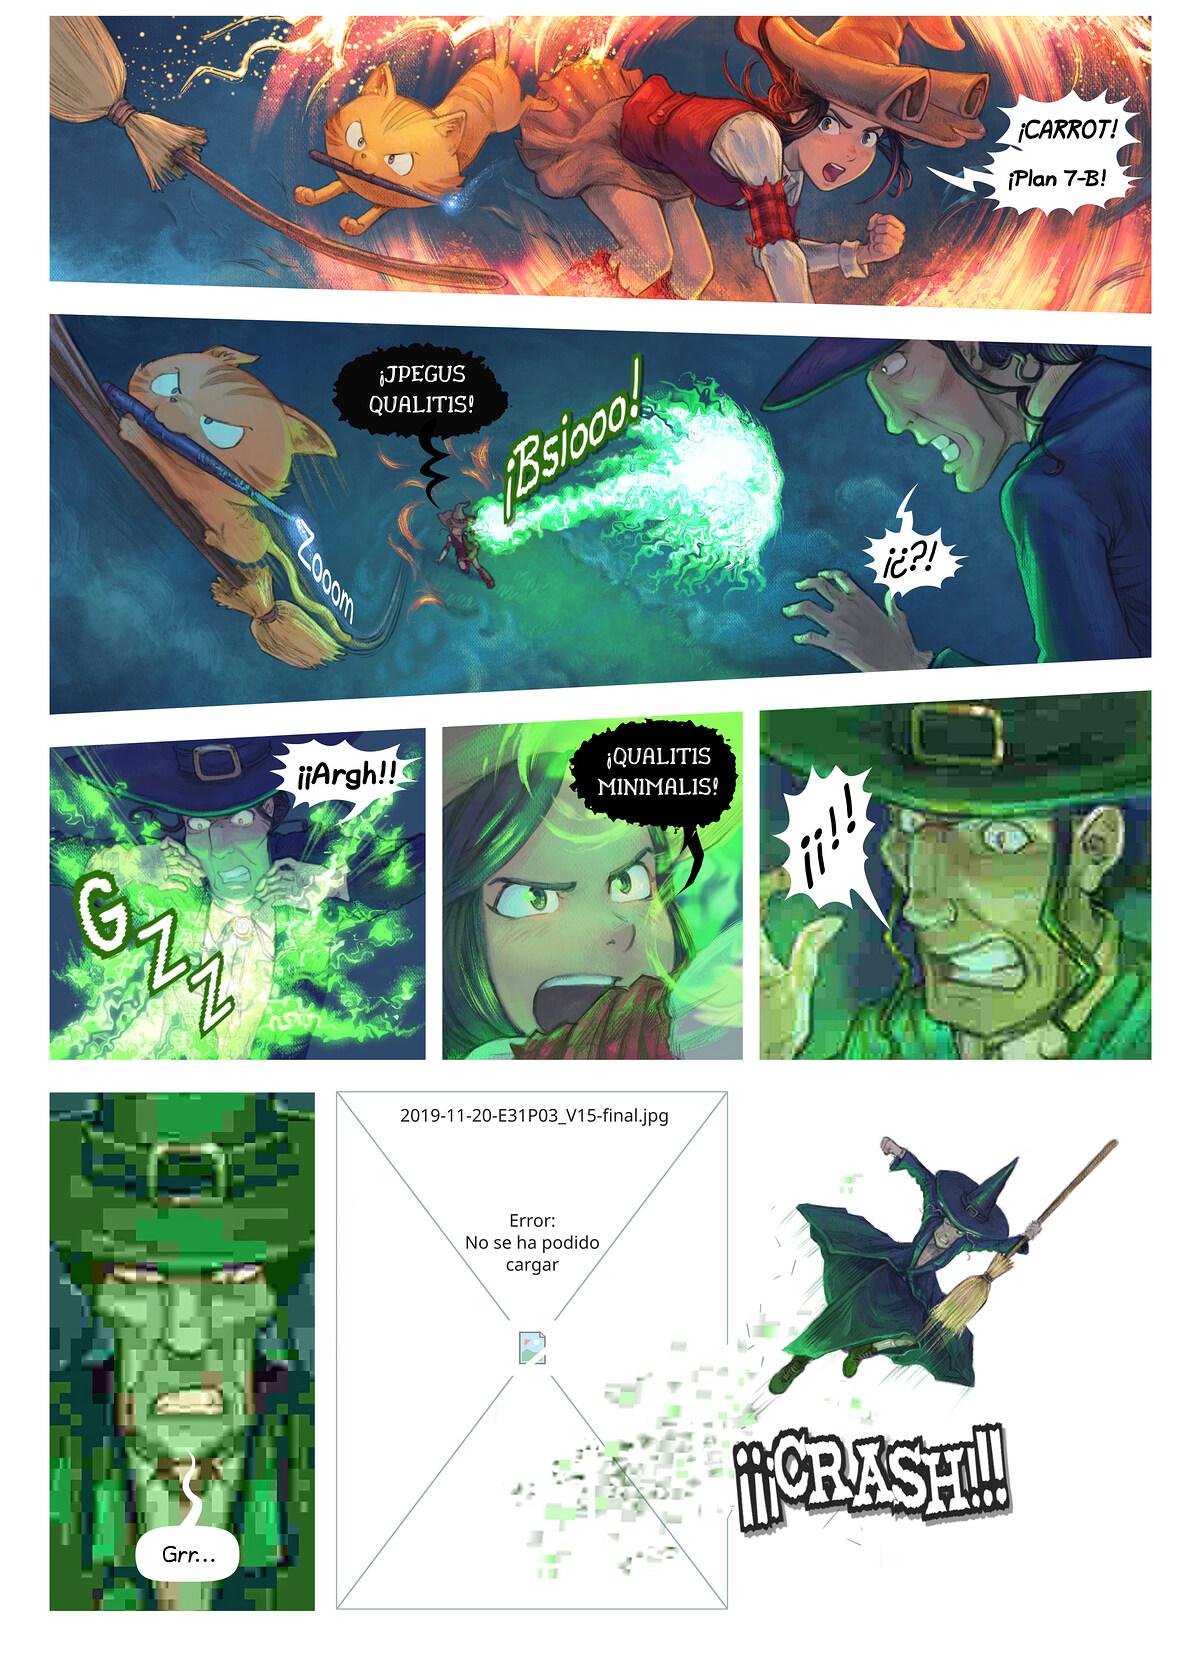 A webcomic page of Pepper&Carrot, episodio 31 [es], página 3